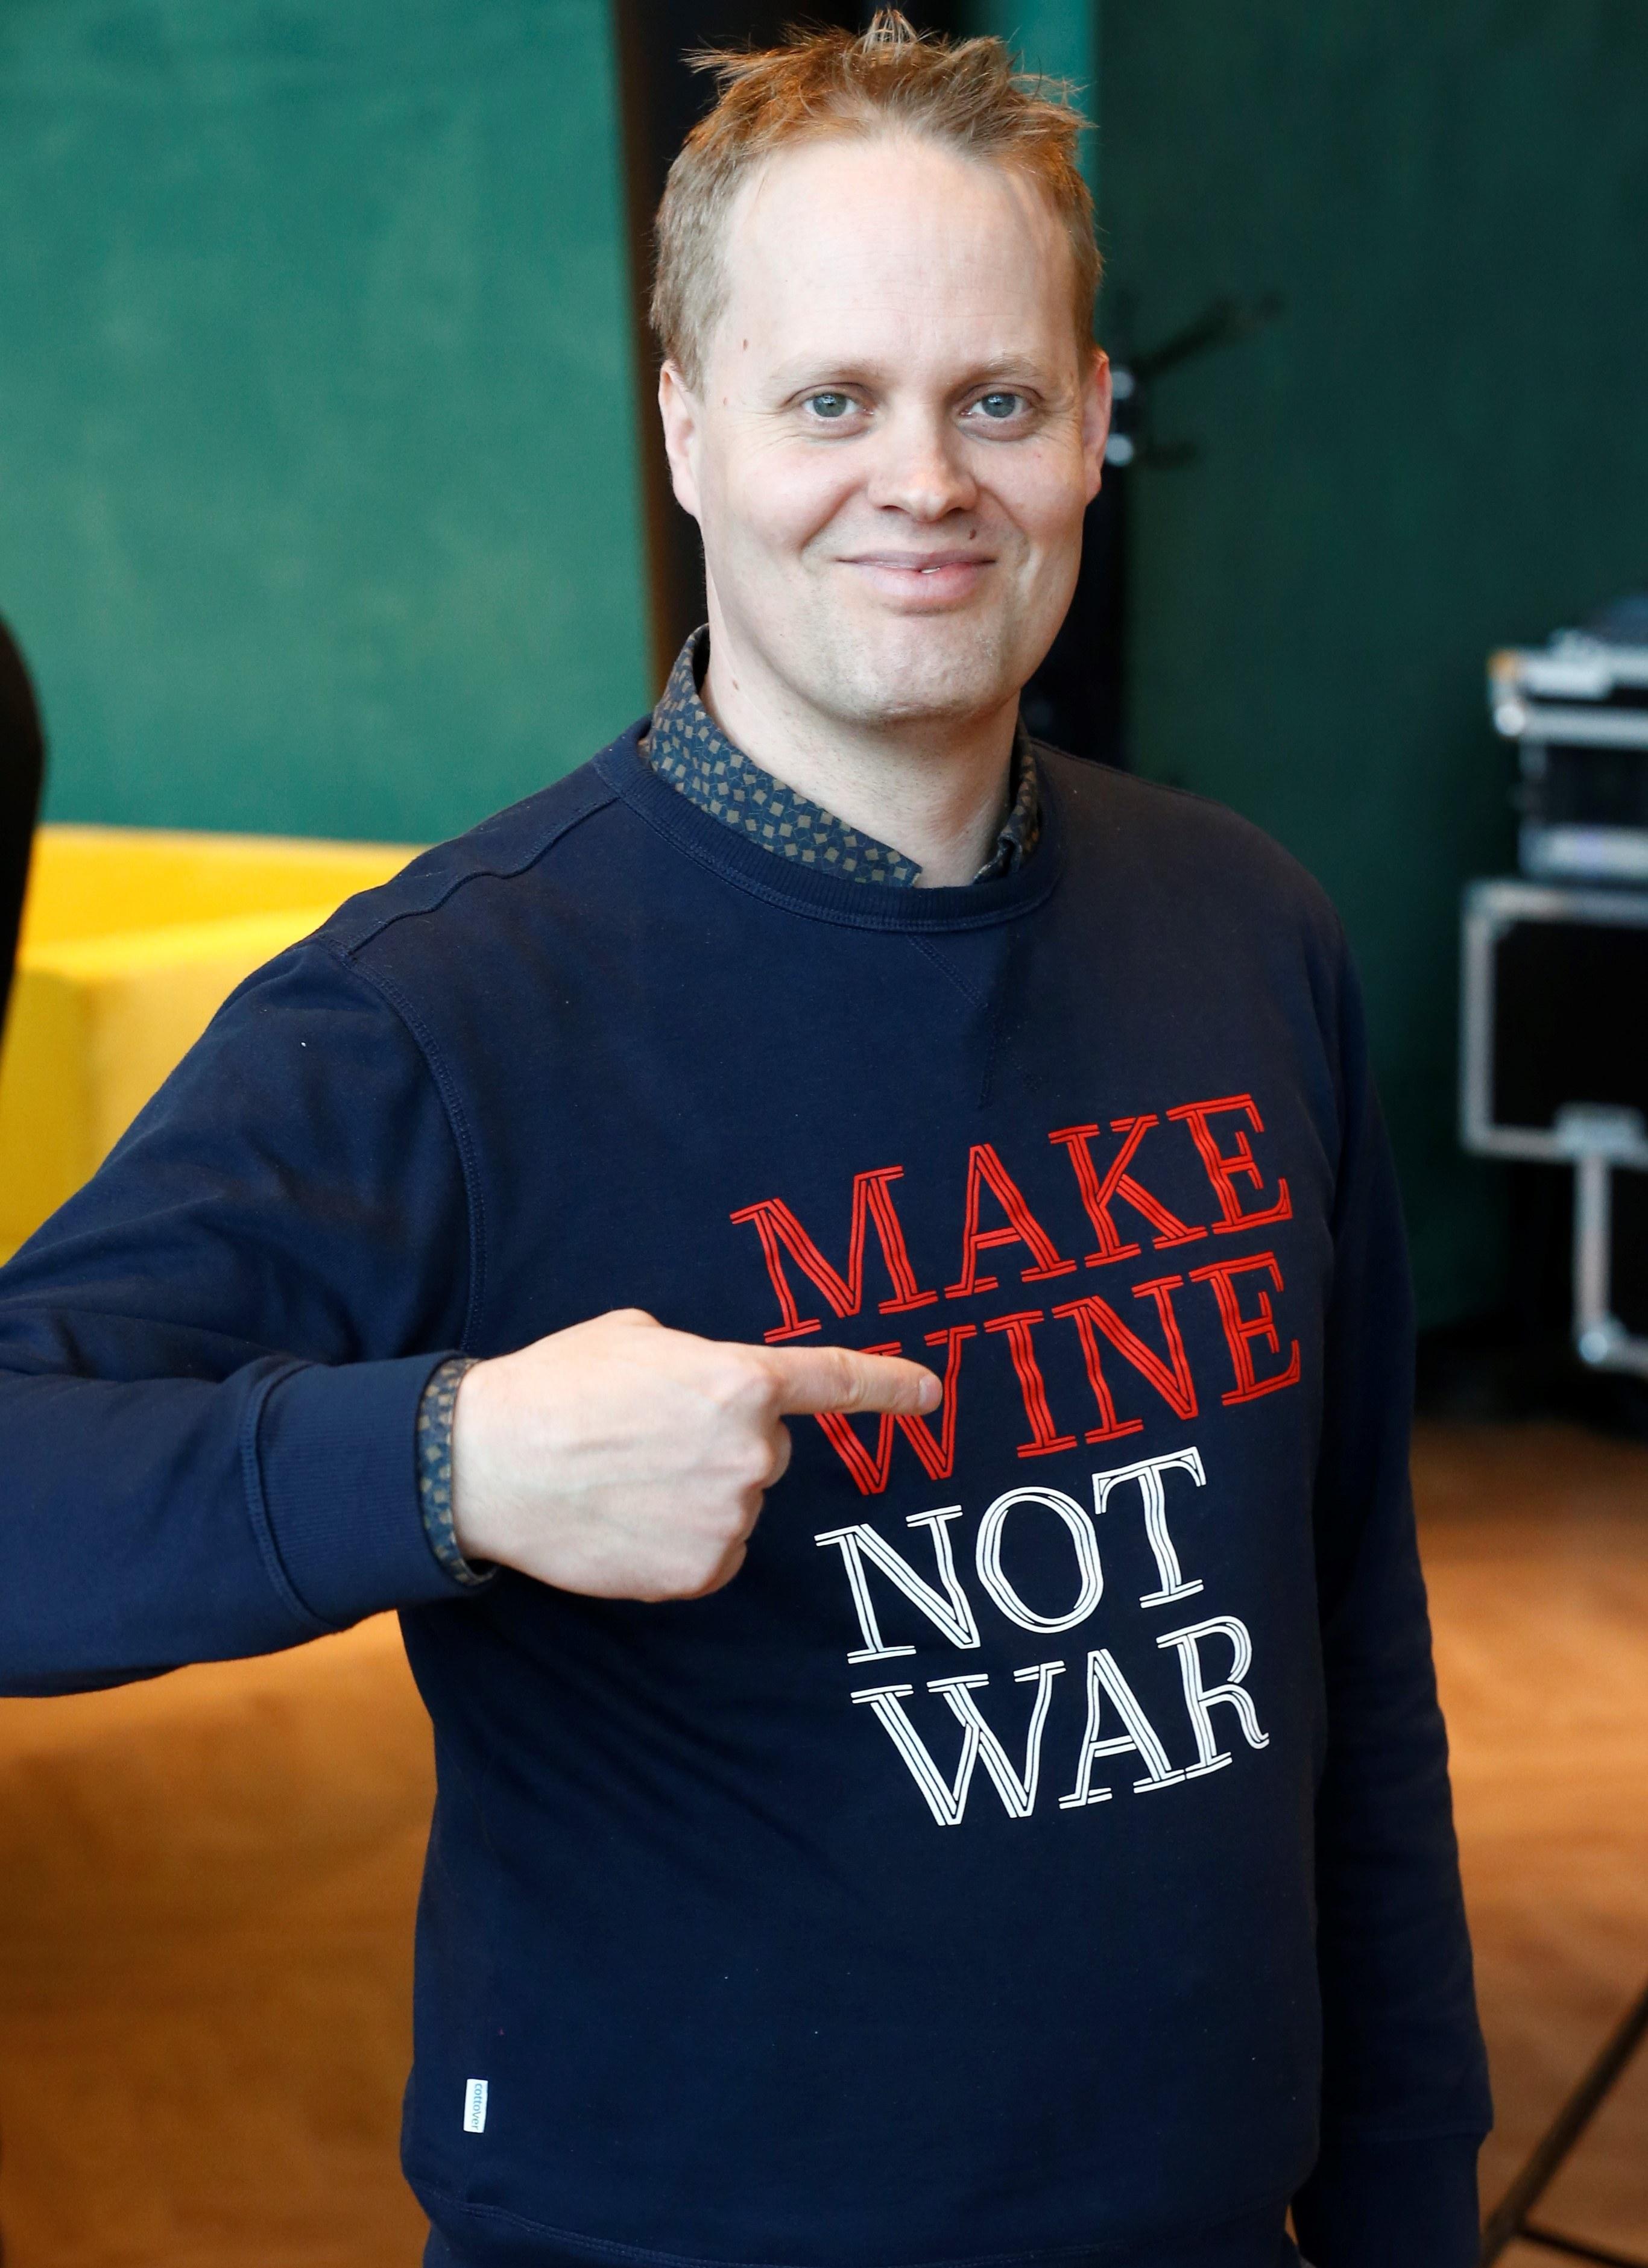 Derrick neleman make wine not war